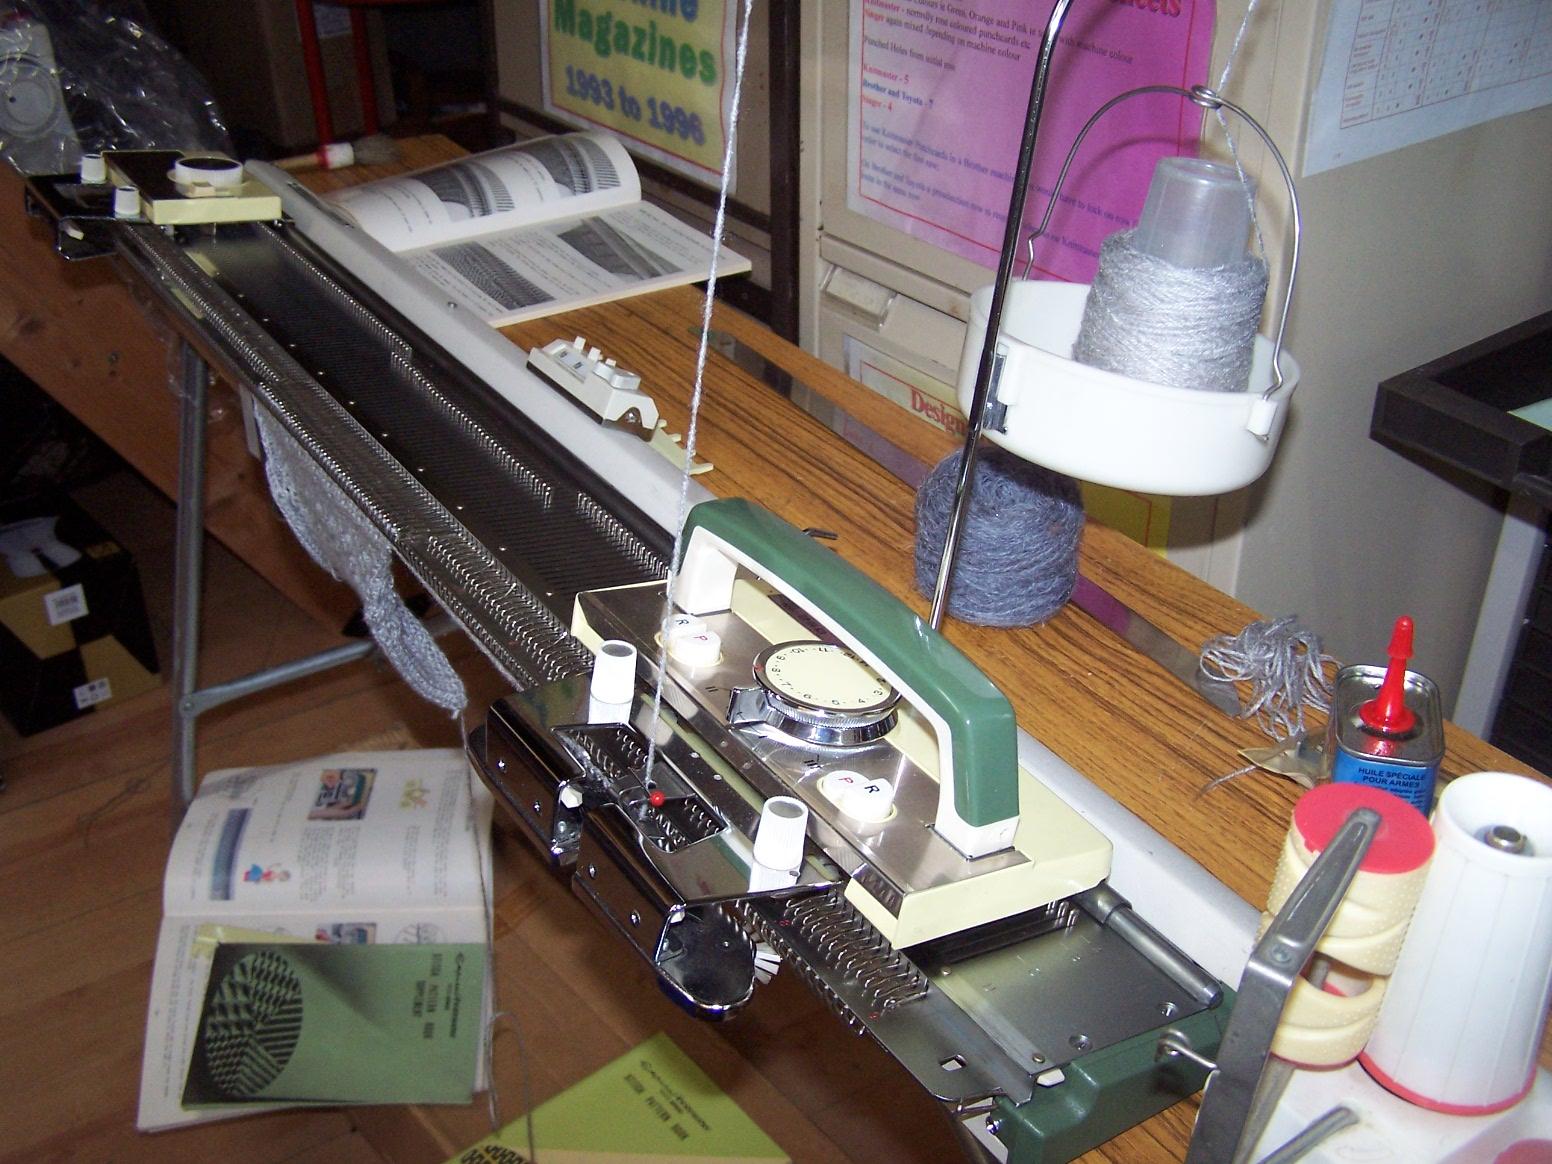 Knitmaster 250